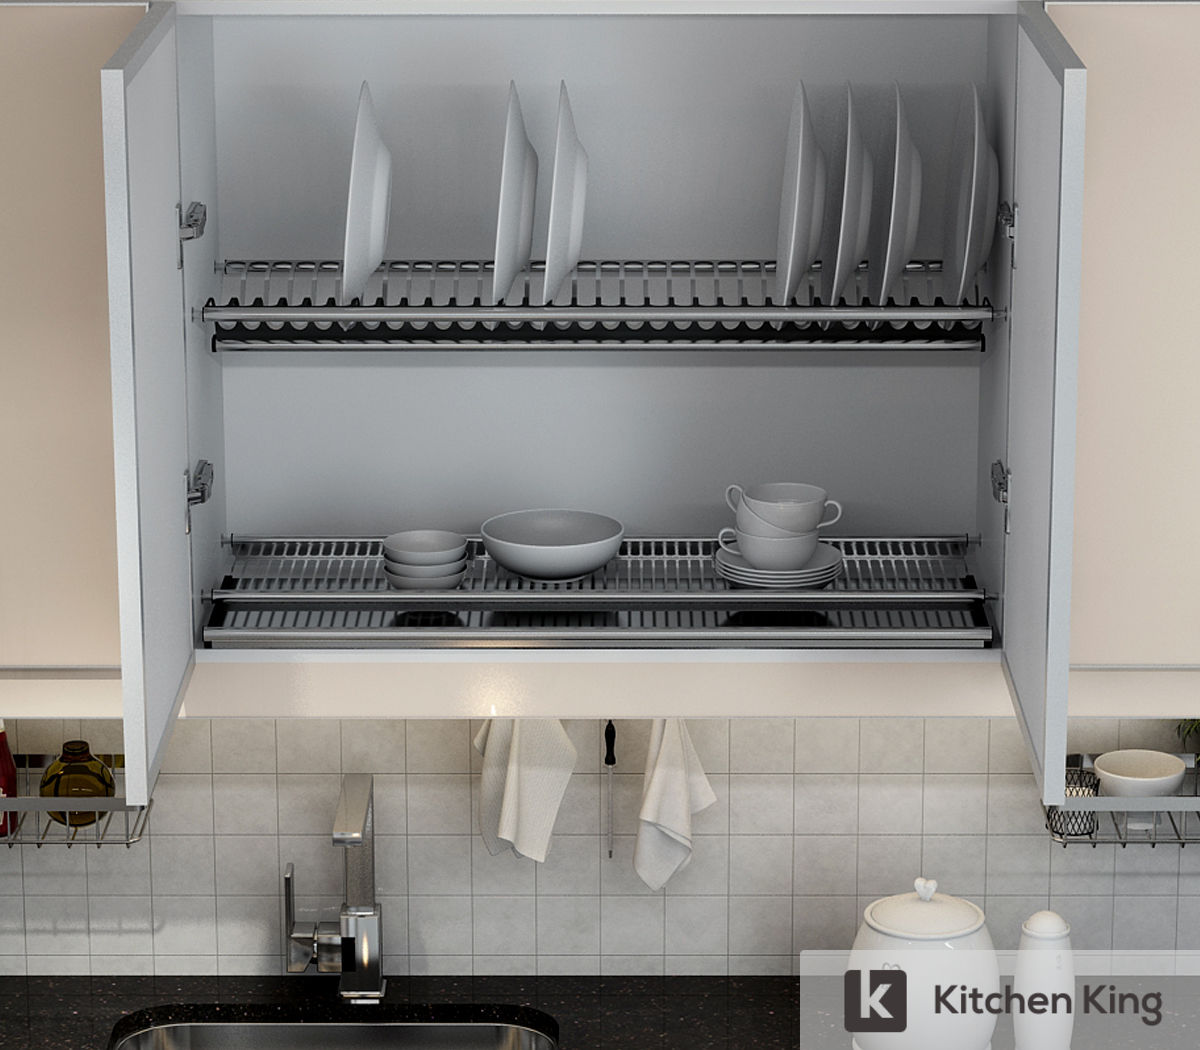 Ikea Kitchen Accessories Uae